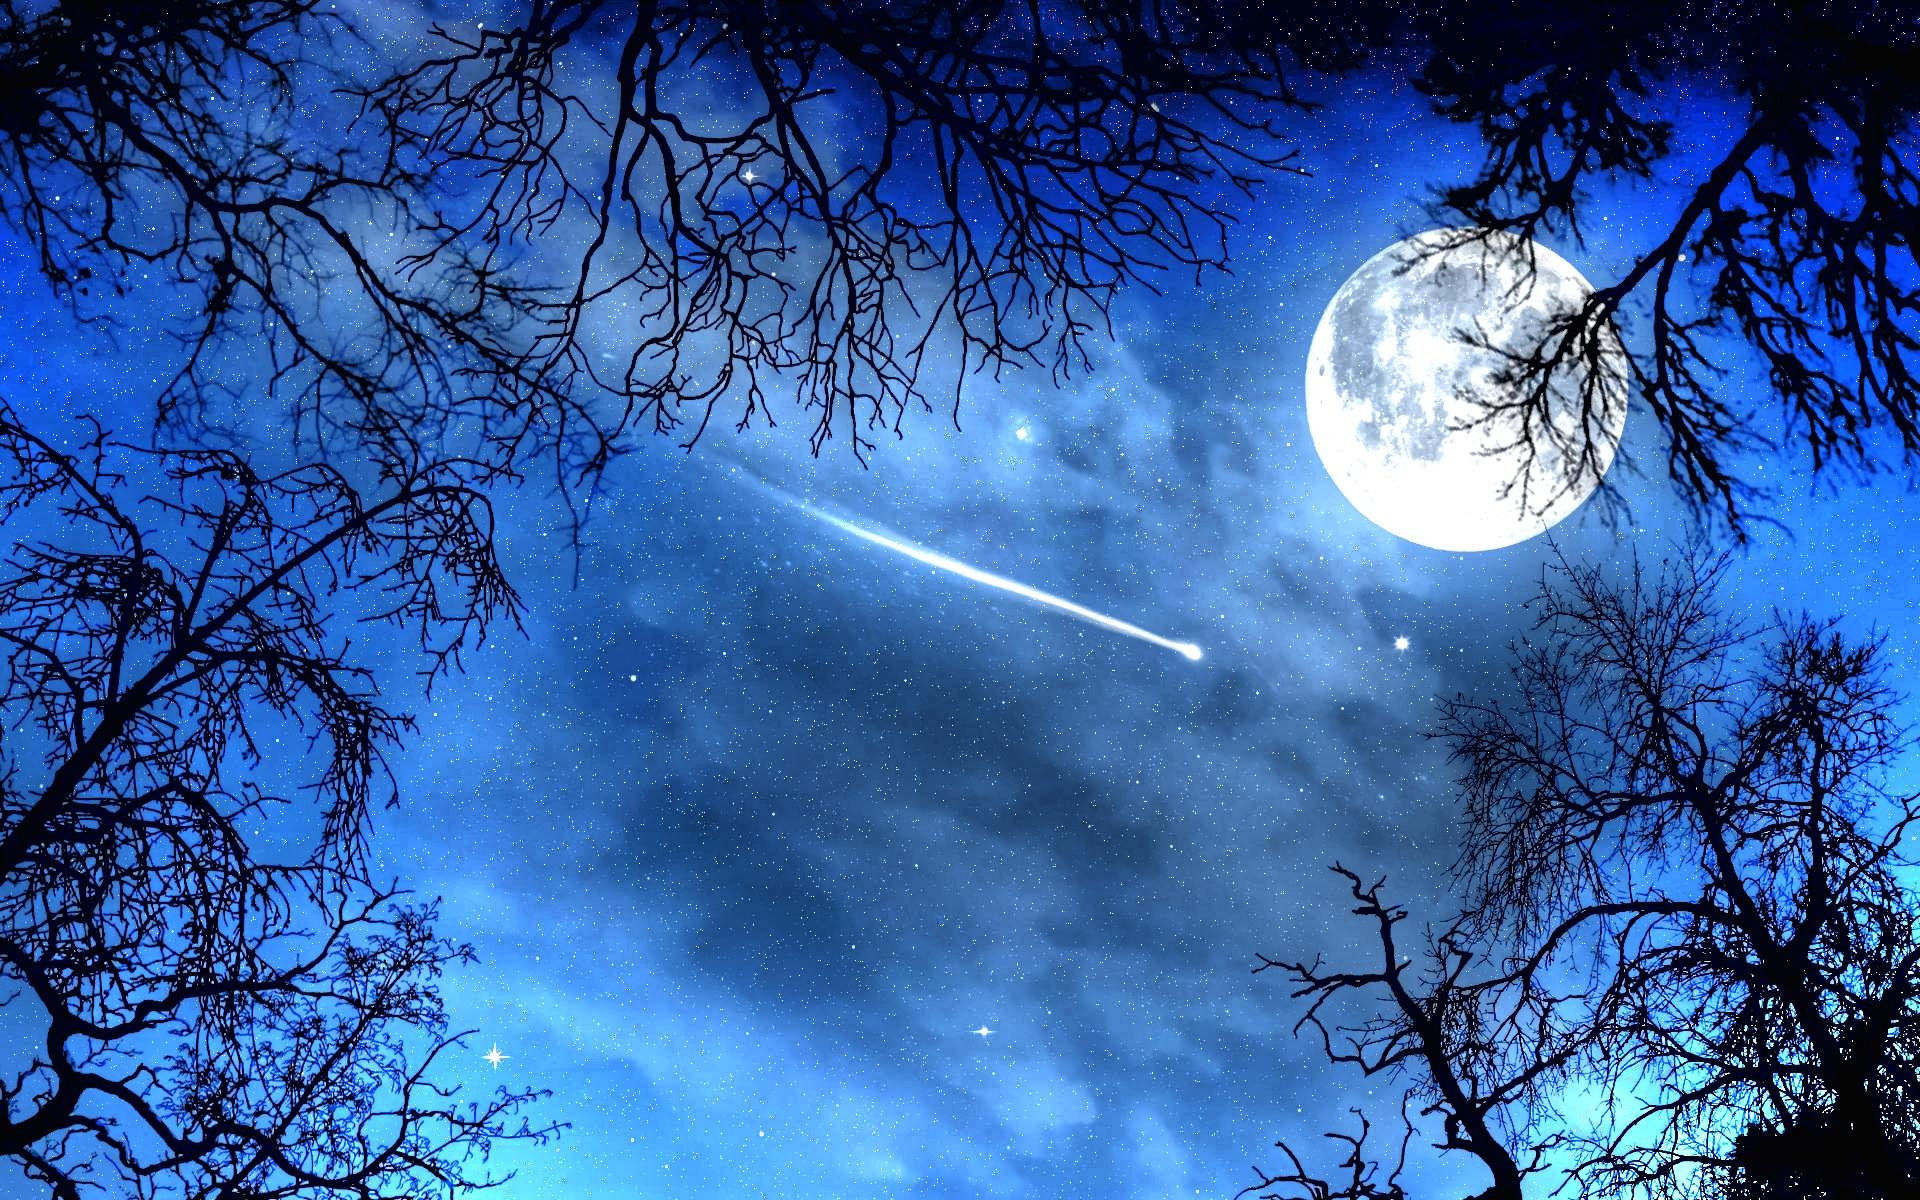 46+ Starry Night Sky Desktop Wallpaper on WallpaperSafari